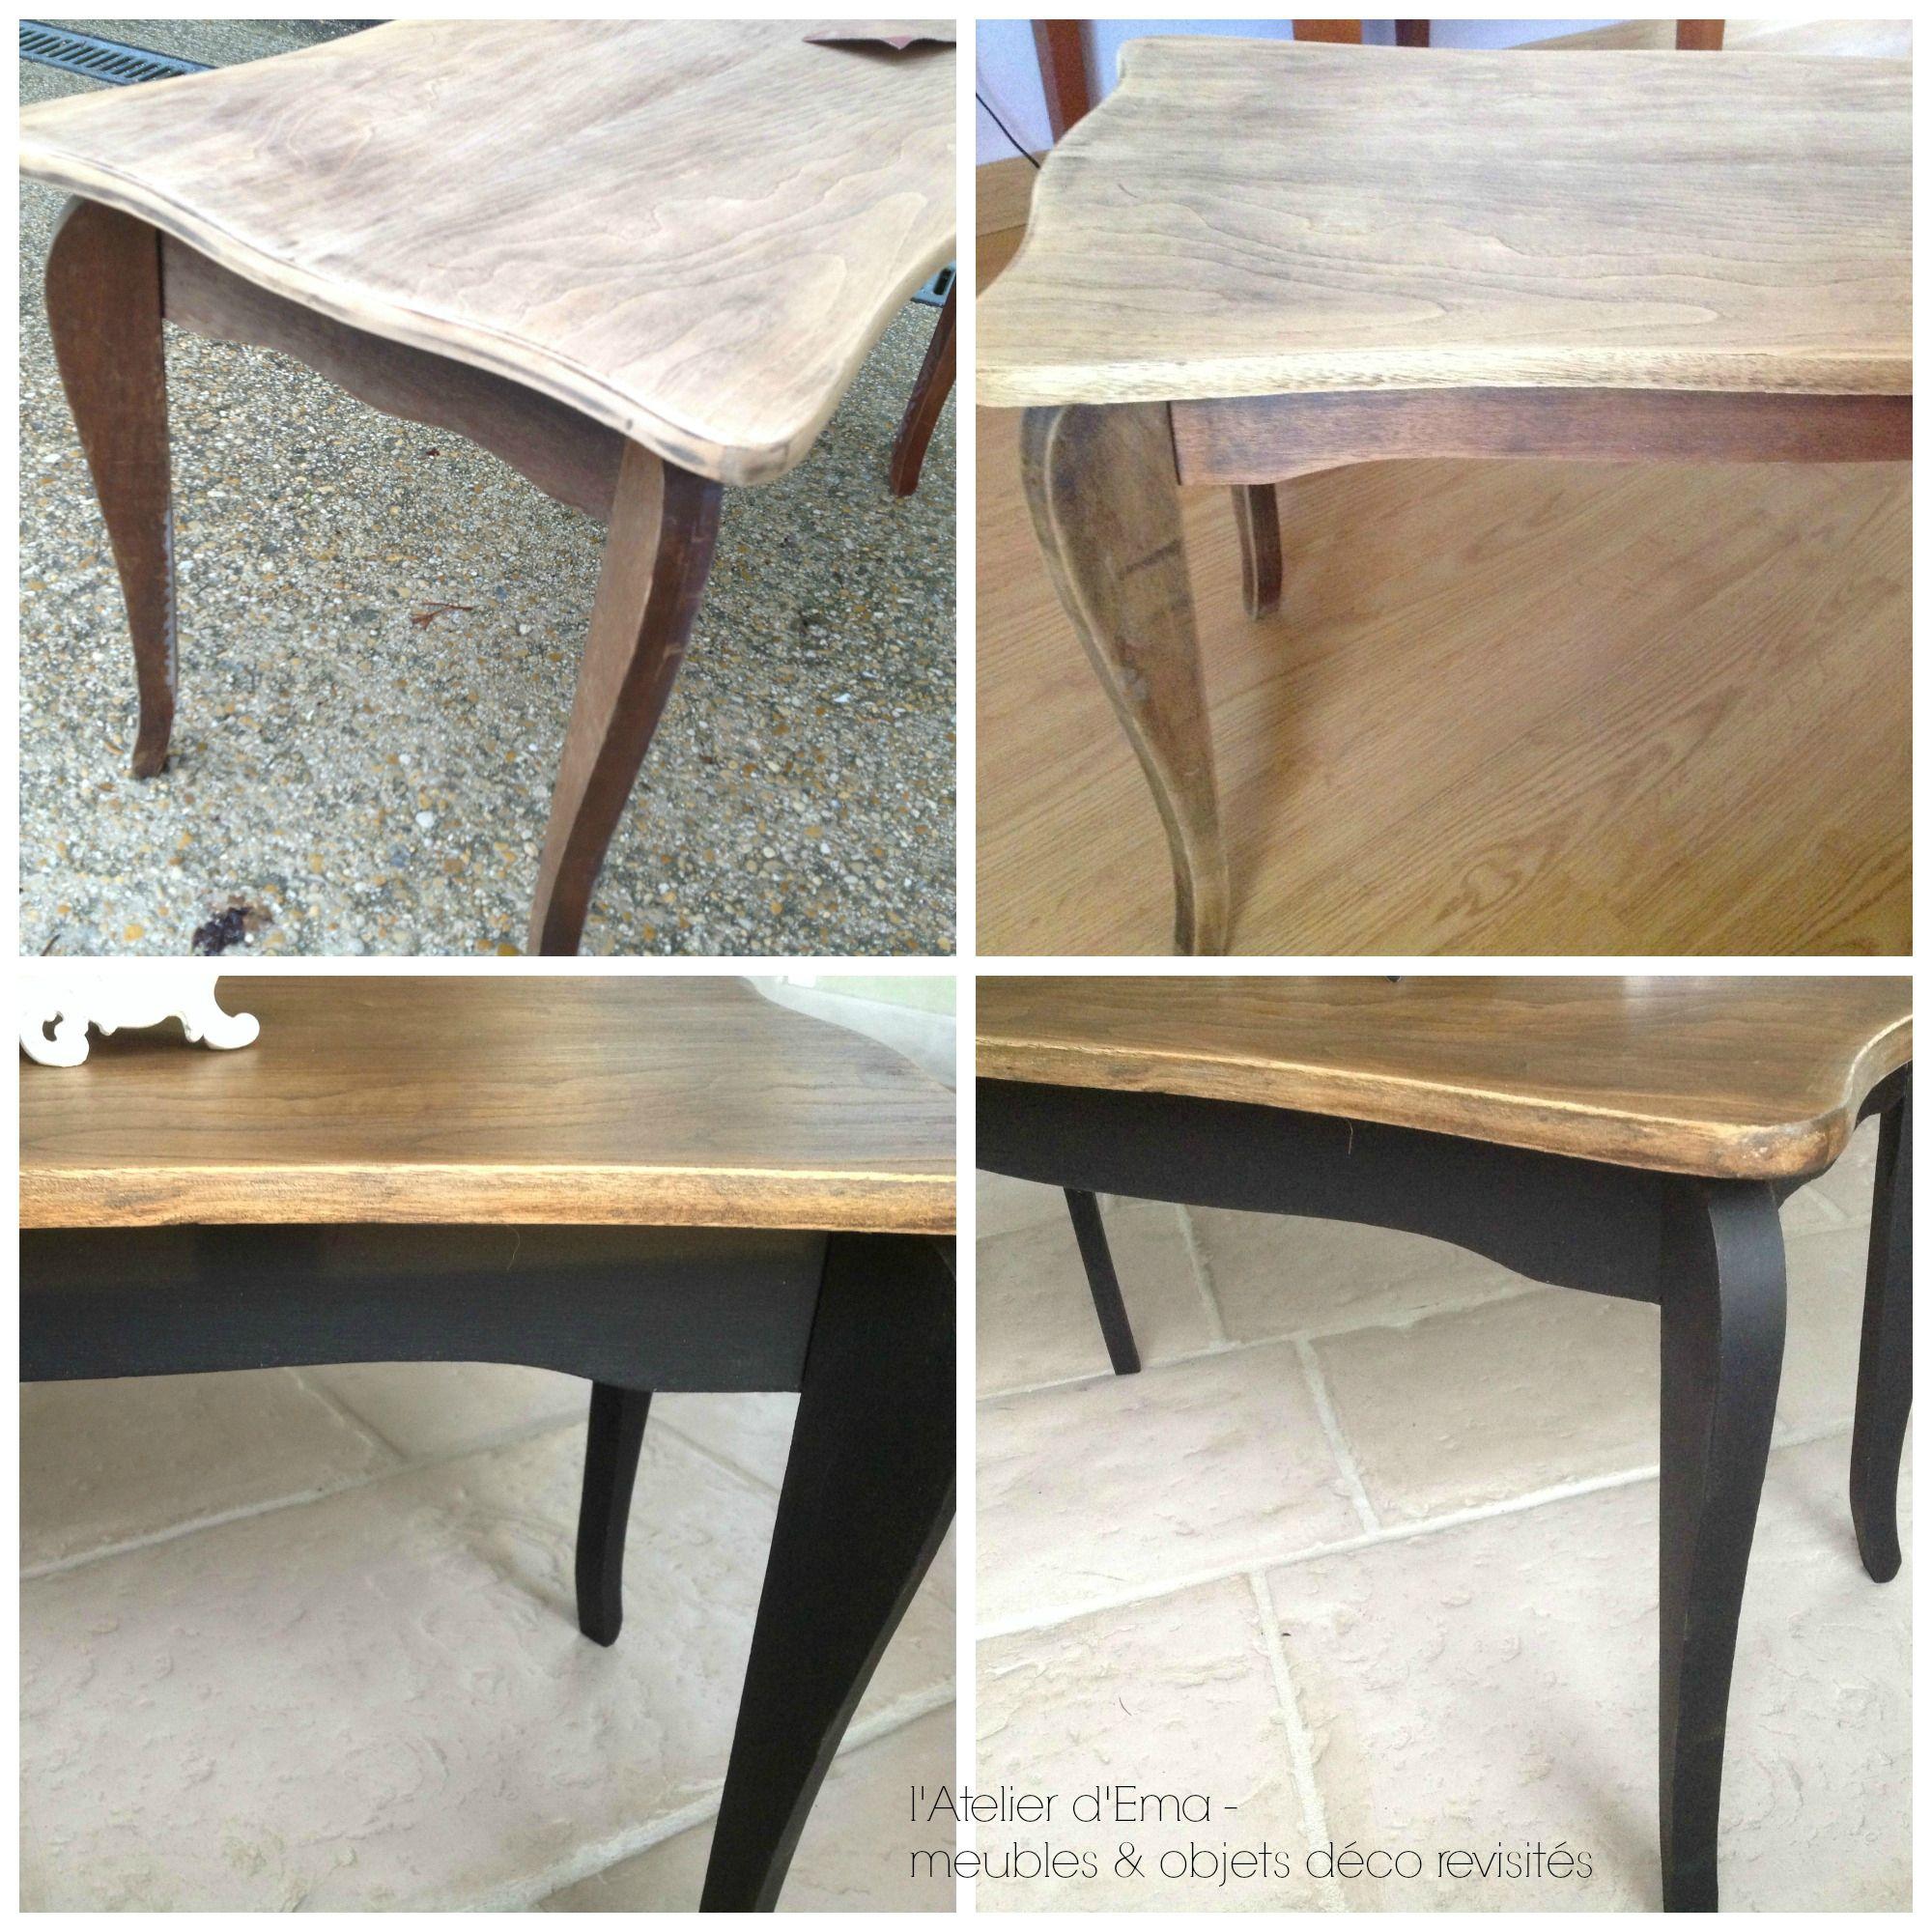 Table Basse En Bois Patinee Noir Bois Naturel Latelierdema  # Mode De Table De Basse